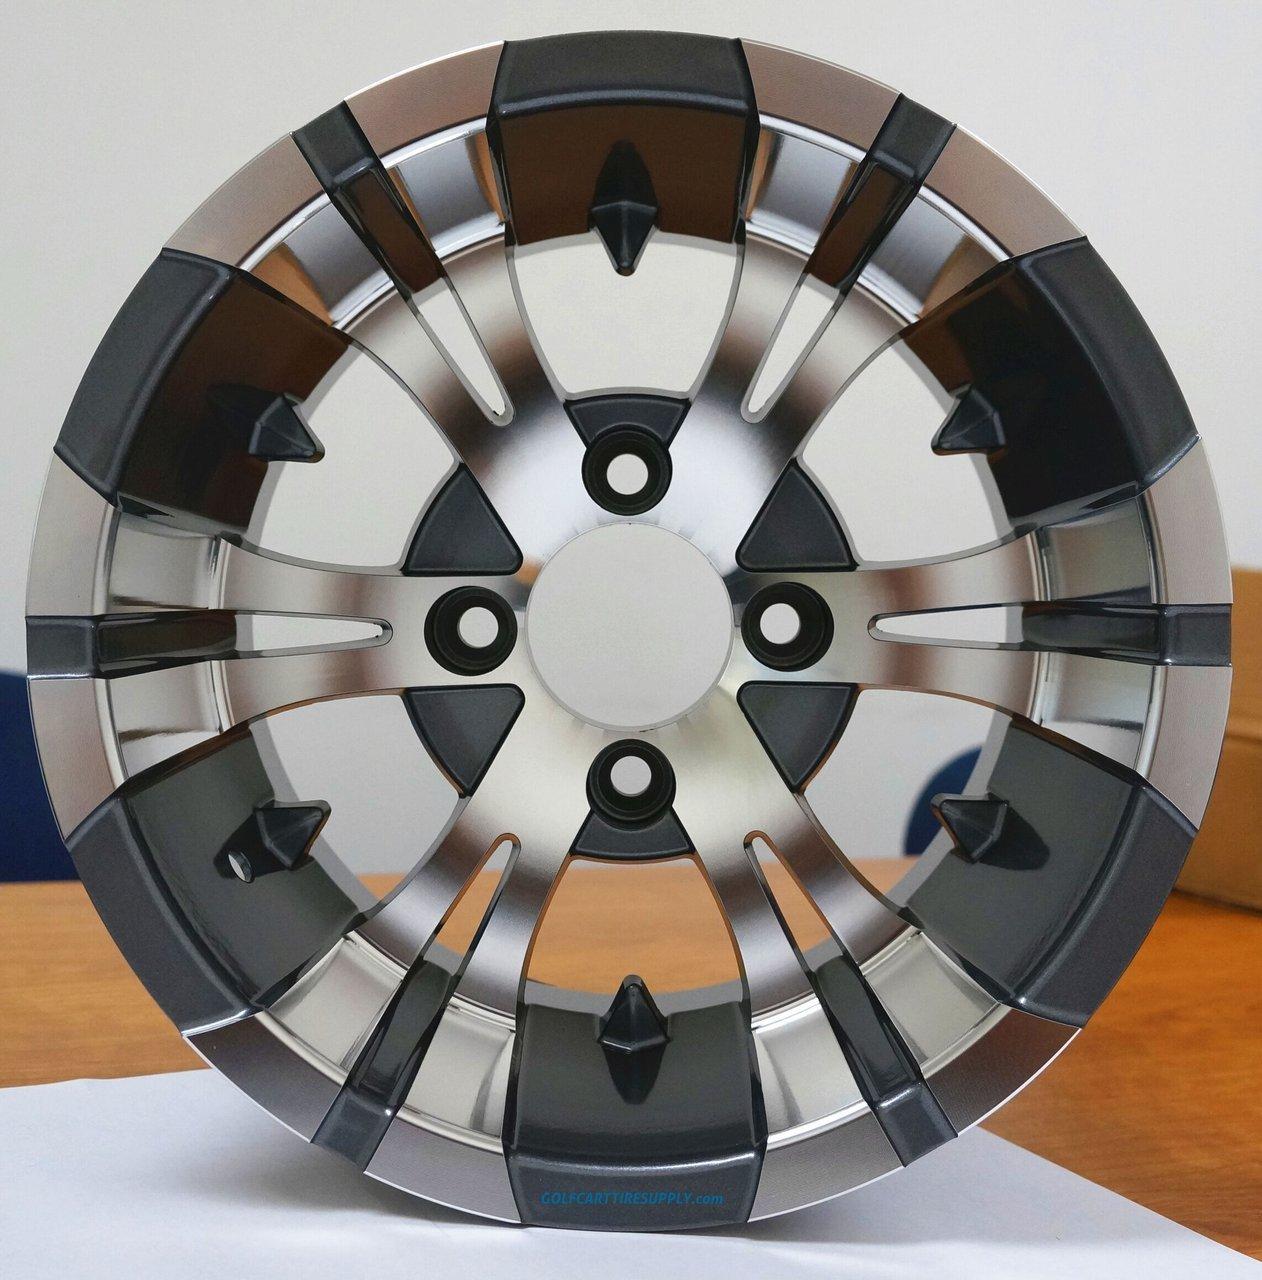 12'' Vampire Gunmetal Aluminum Wheels and 23X10.5-12'' All Terrain Golf Cart Tires Combo - Set of 4 by Golf Cart Tire Supply (Image #4)